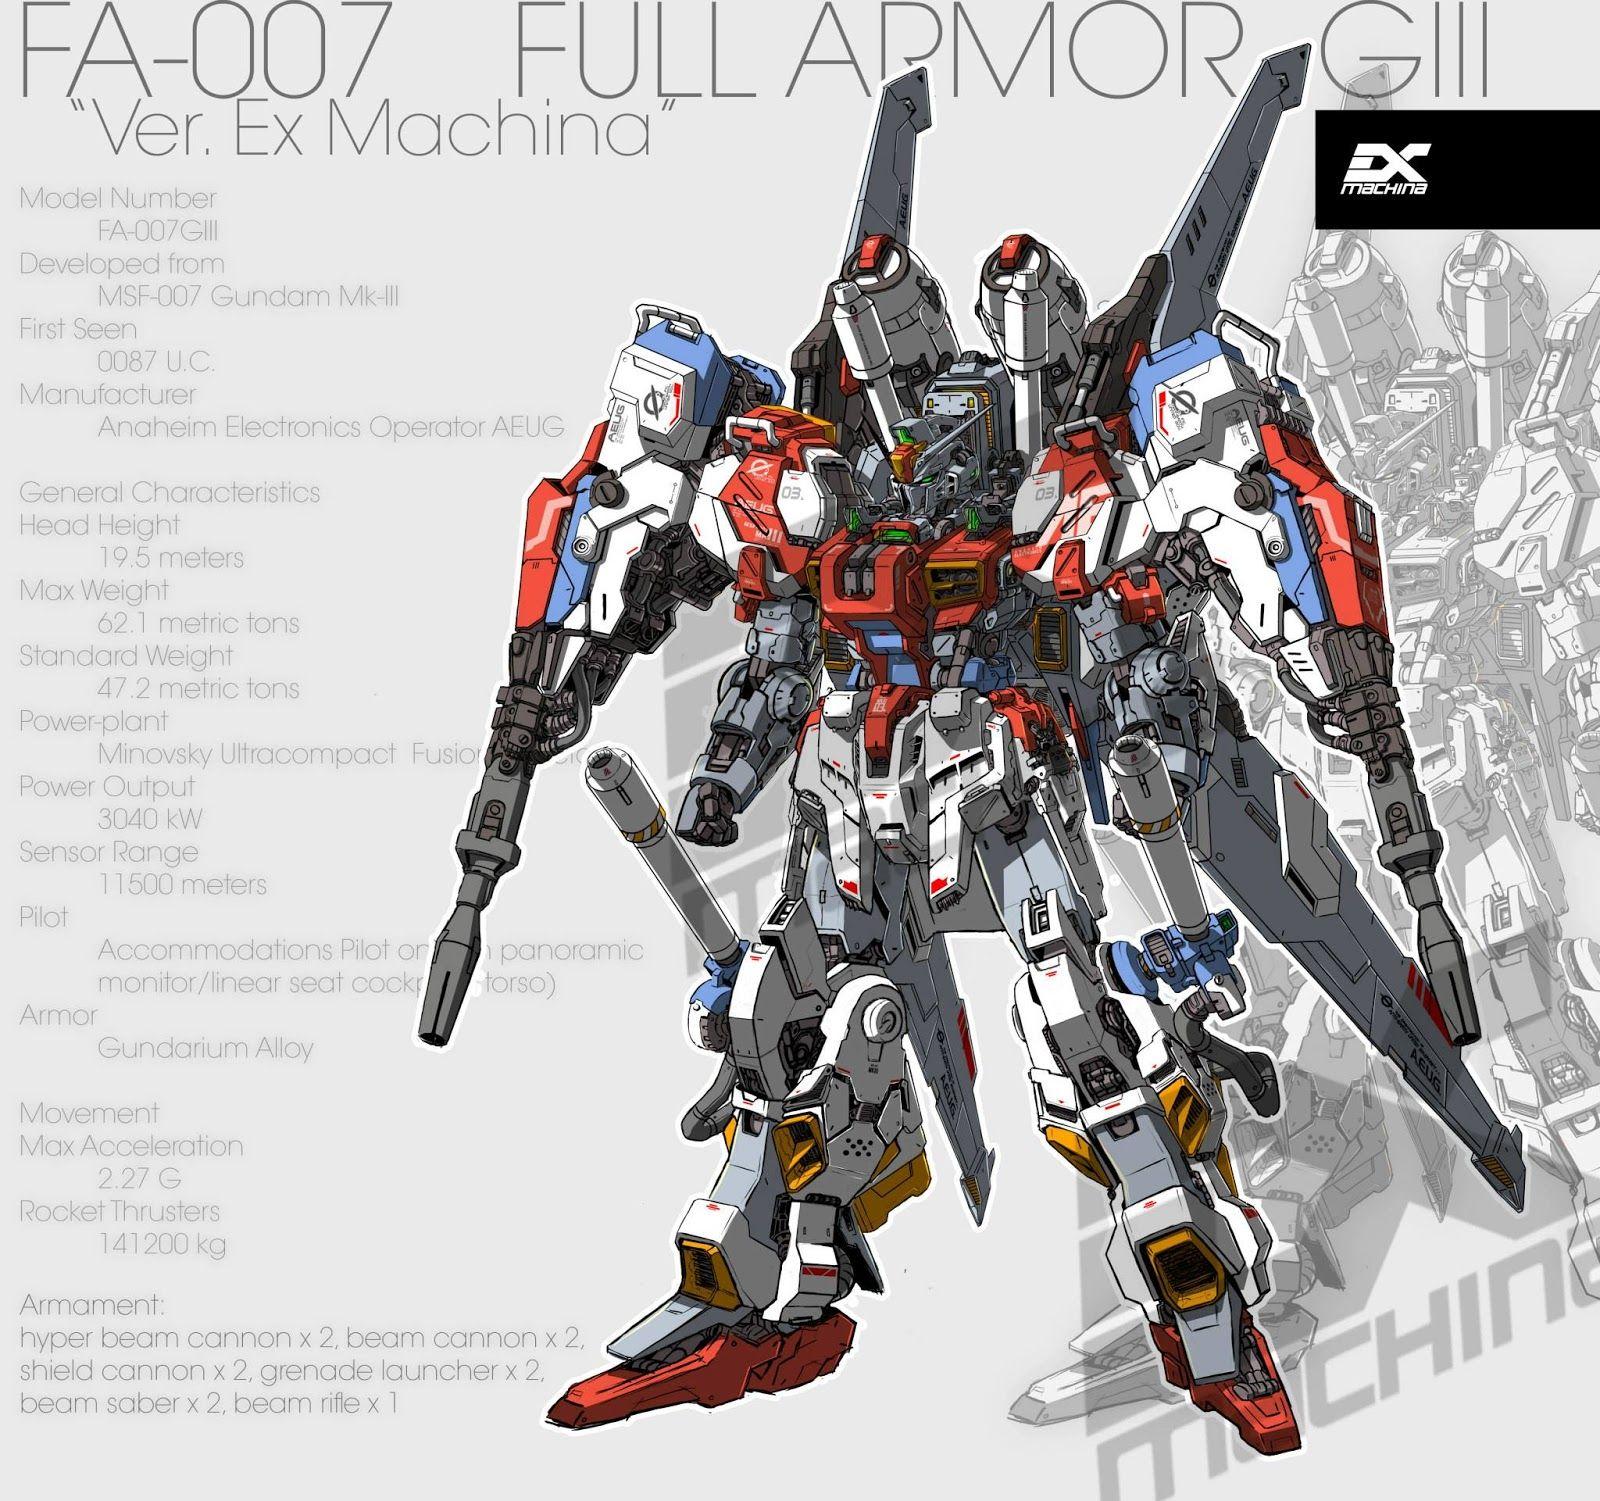 Gundam Guy Ex Machina Fa 007 Full Armor G Iii Ver Ex Machina